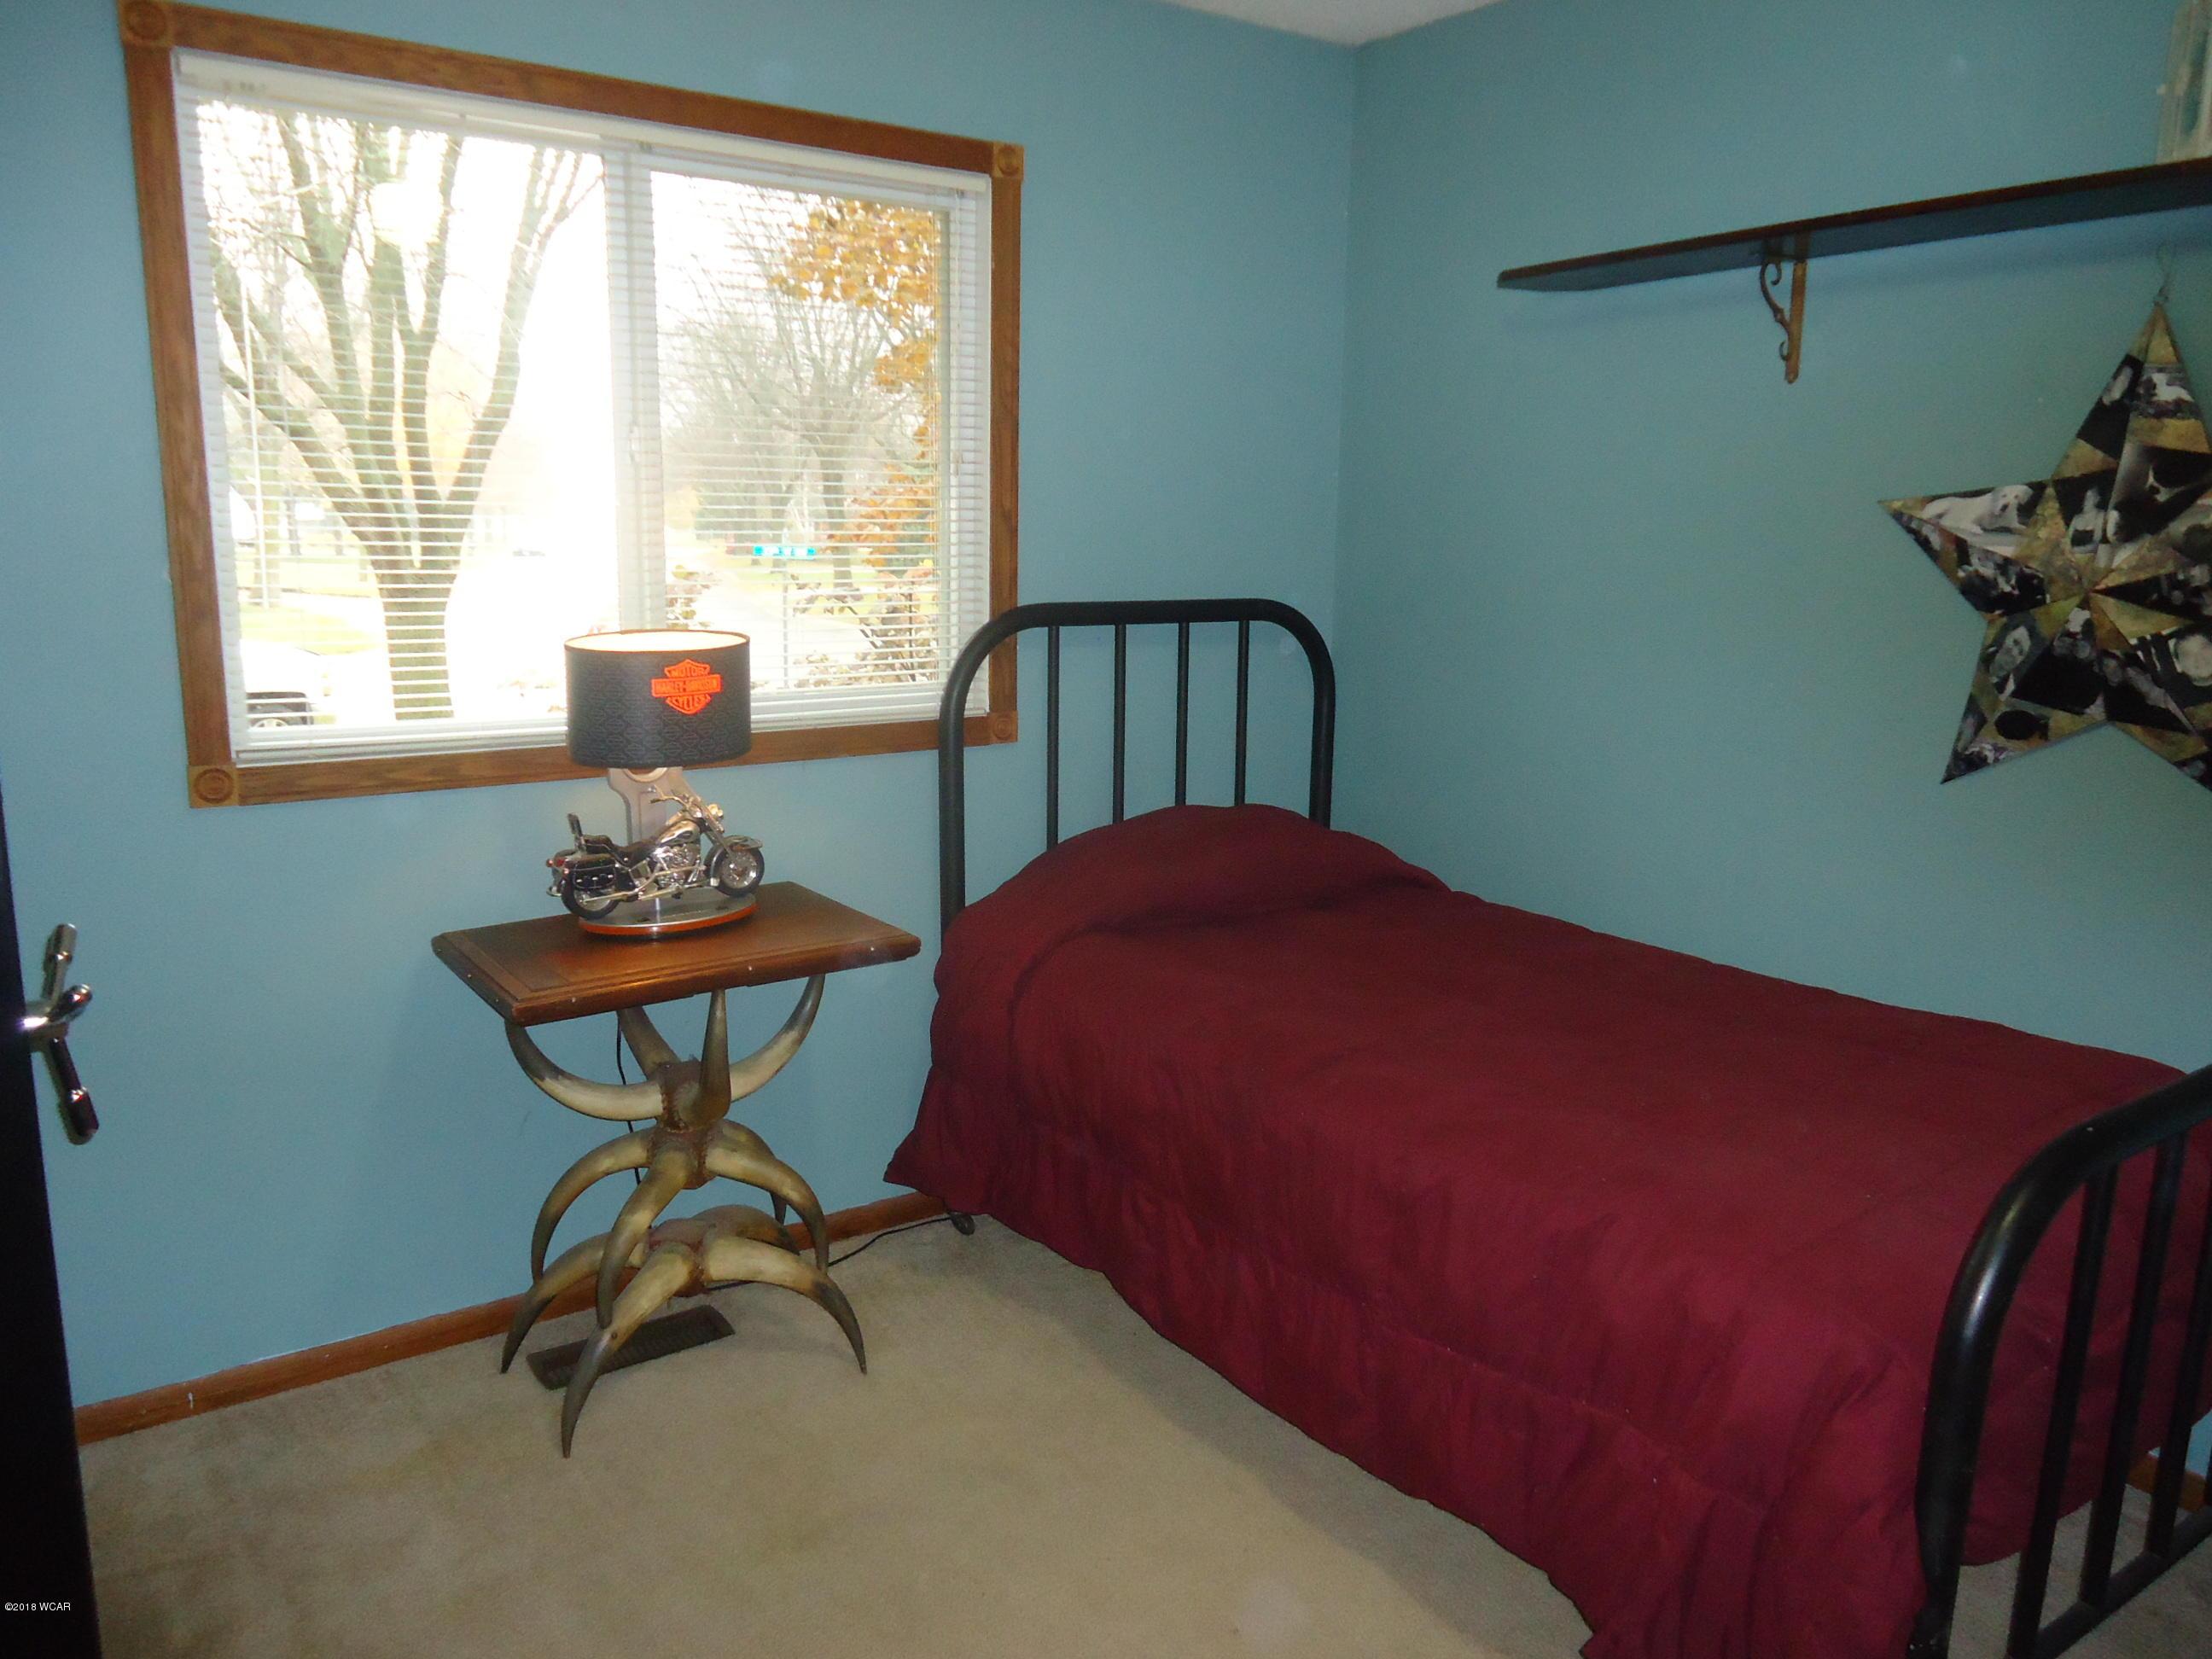 317 33rd Street,Willmar,4 Bedrooms Bedrooms,2 BathroomsBathrooms,Single Family,33rd Street,6032767